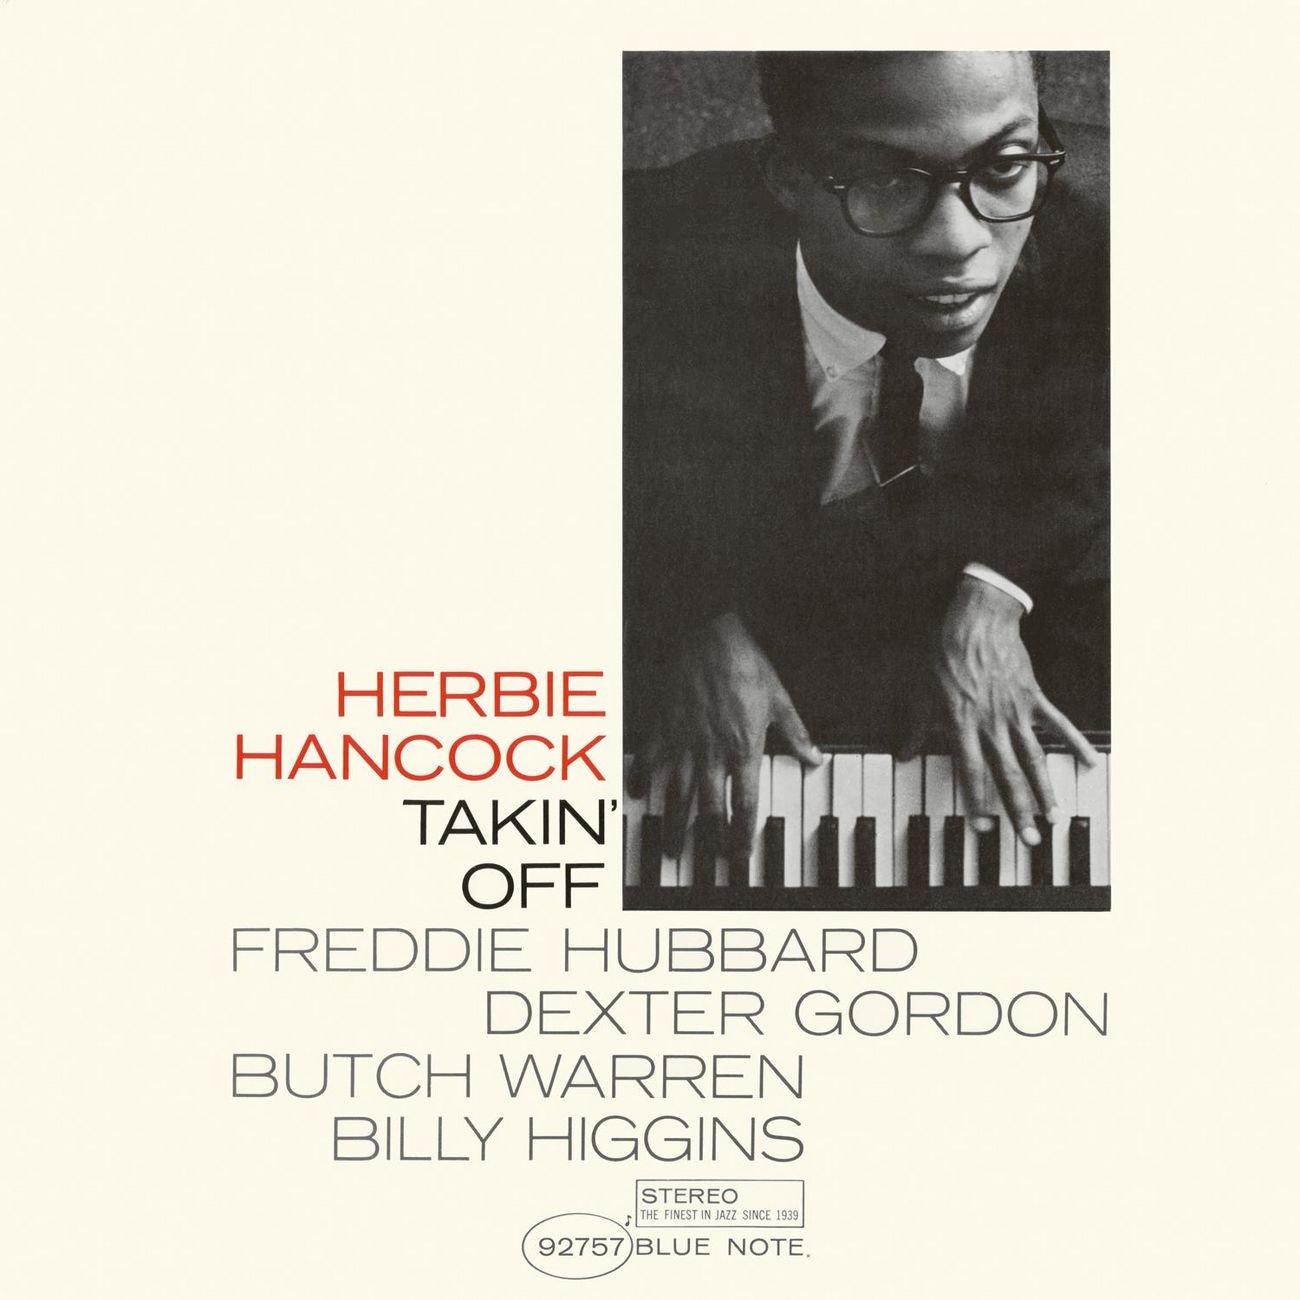 Херби Хэнкок Herbie Hancock. Takin' Off herbie hancock the ultimate